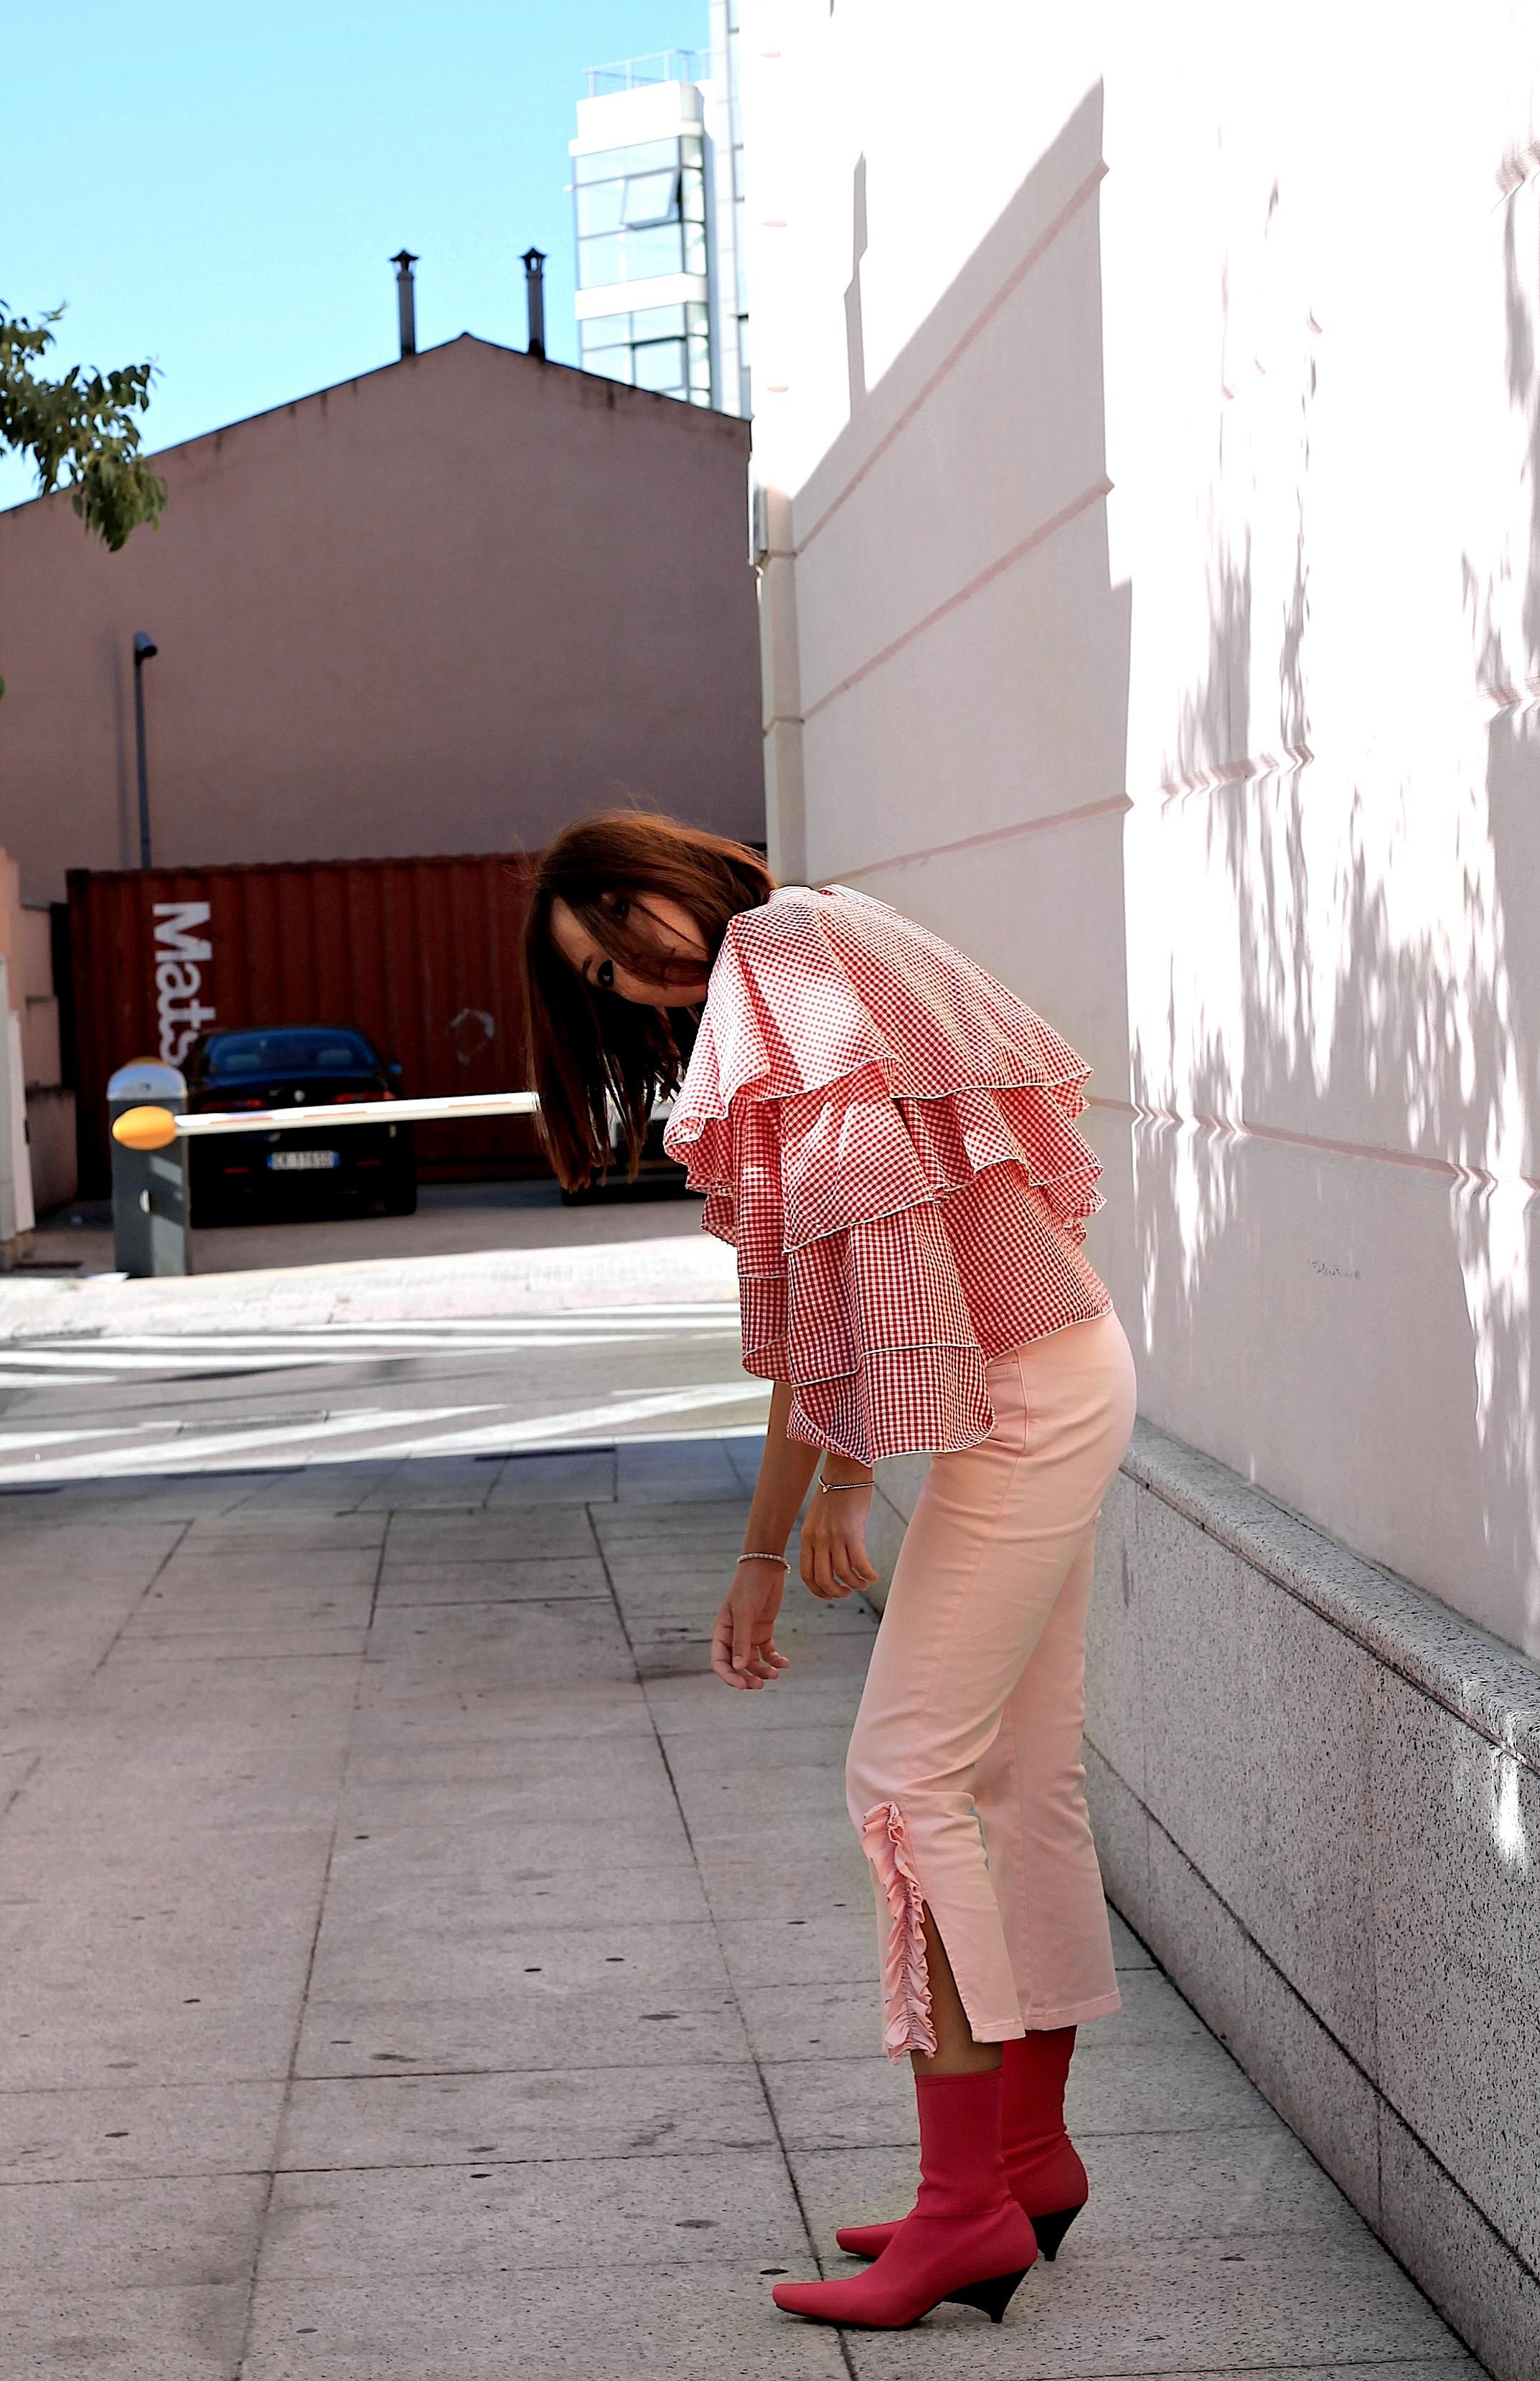 Valentino uomo SS 2018, theladycracy.it, elisa bellino, VLTN logo valentino, sfilata valentino ss 2018, fashion blog, fashion blogger italiane 2017, blogger moda più seguite 2017, fashion blogger famose 2017, fashion blogger milano 2017, outfit estivi 2017, pantaloni zara 2017, come vestirsi bene estate 2017, top loeil, top volant 2017, top spalle scoperte 2017, stivaletti zara estate 2017